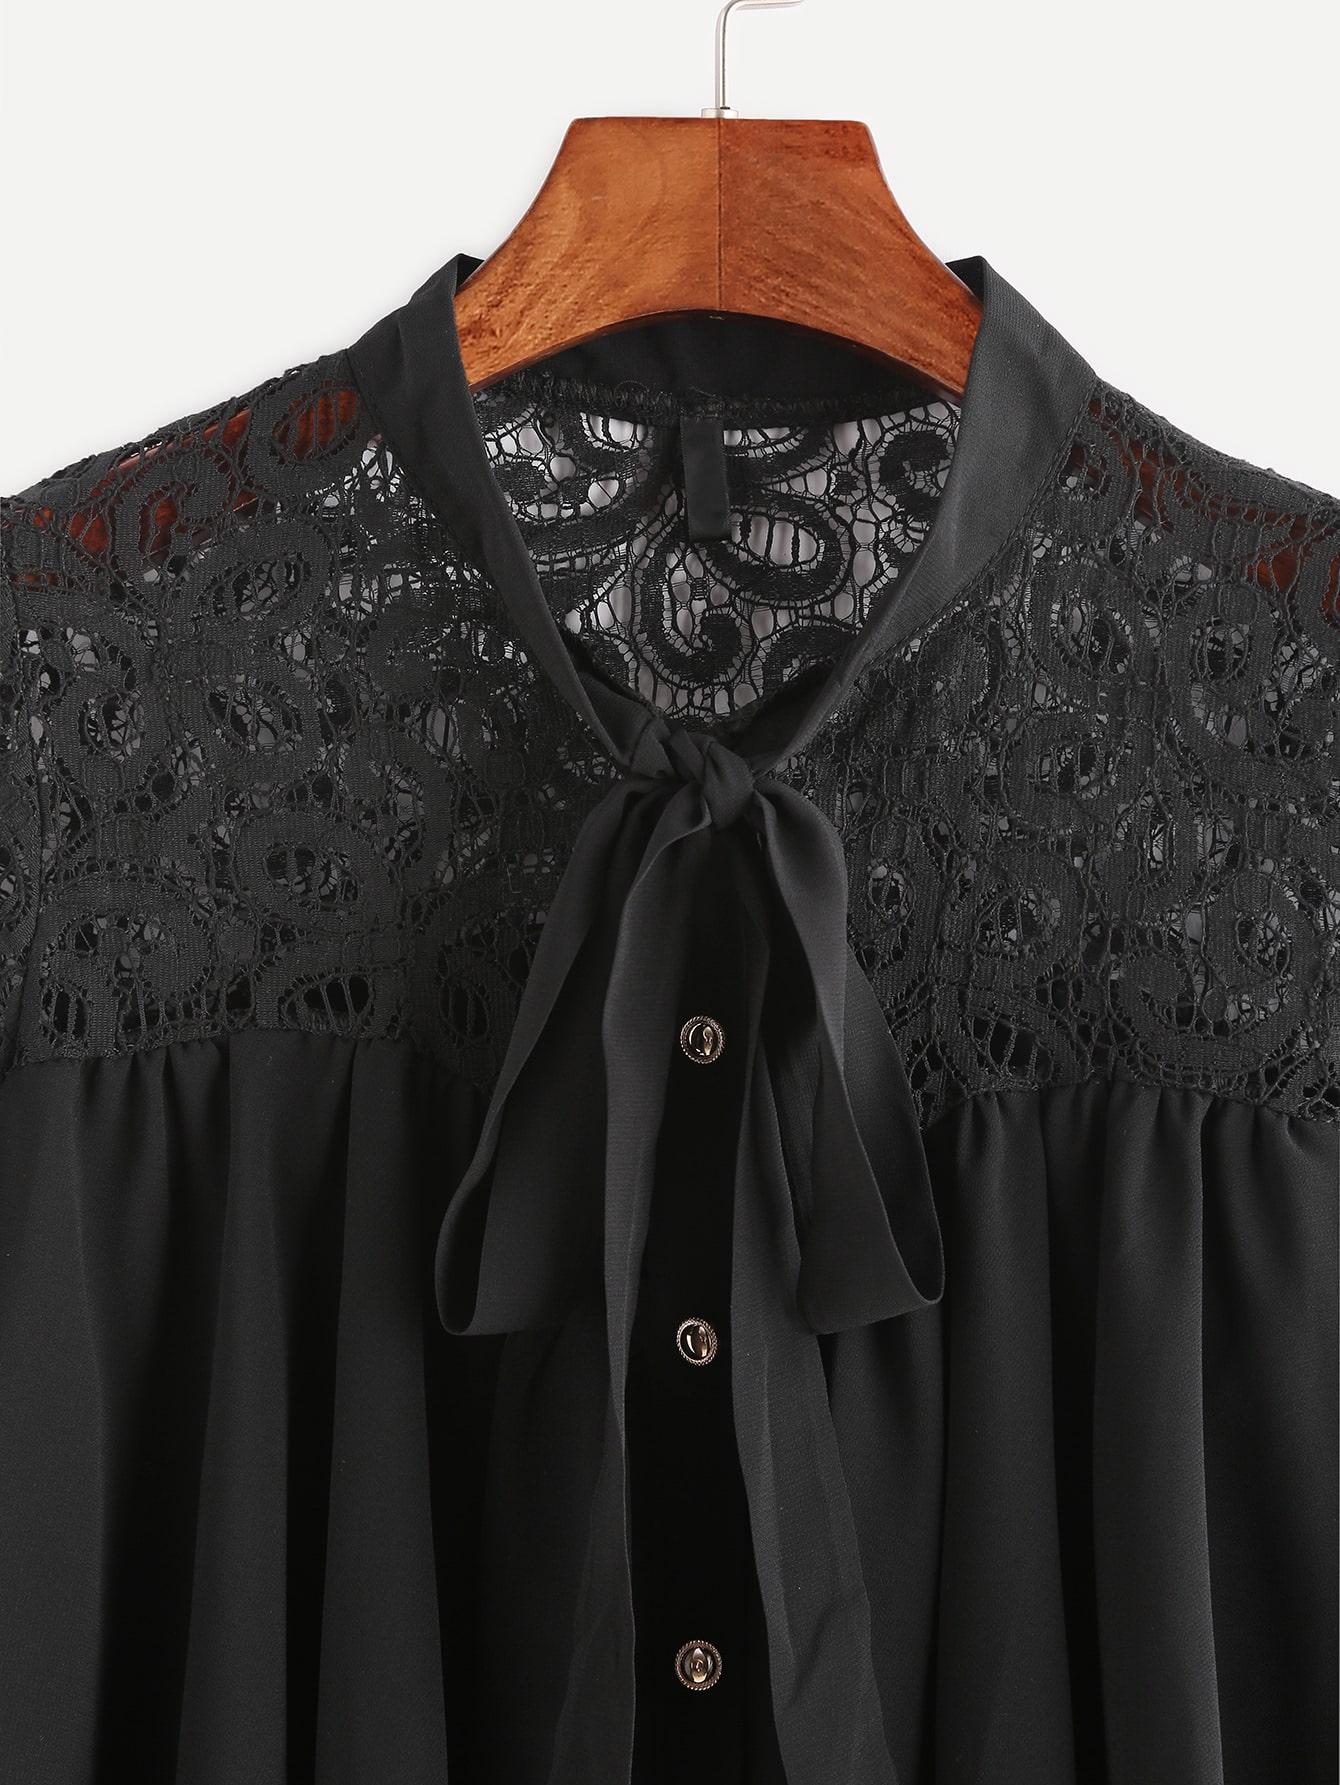 blouse161226003_2